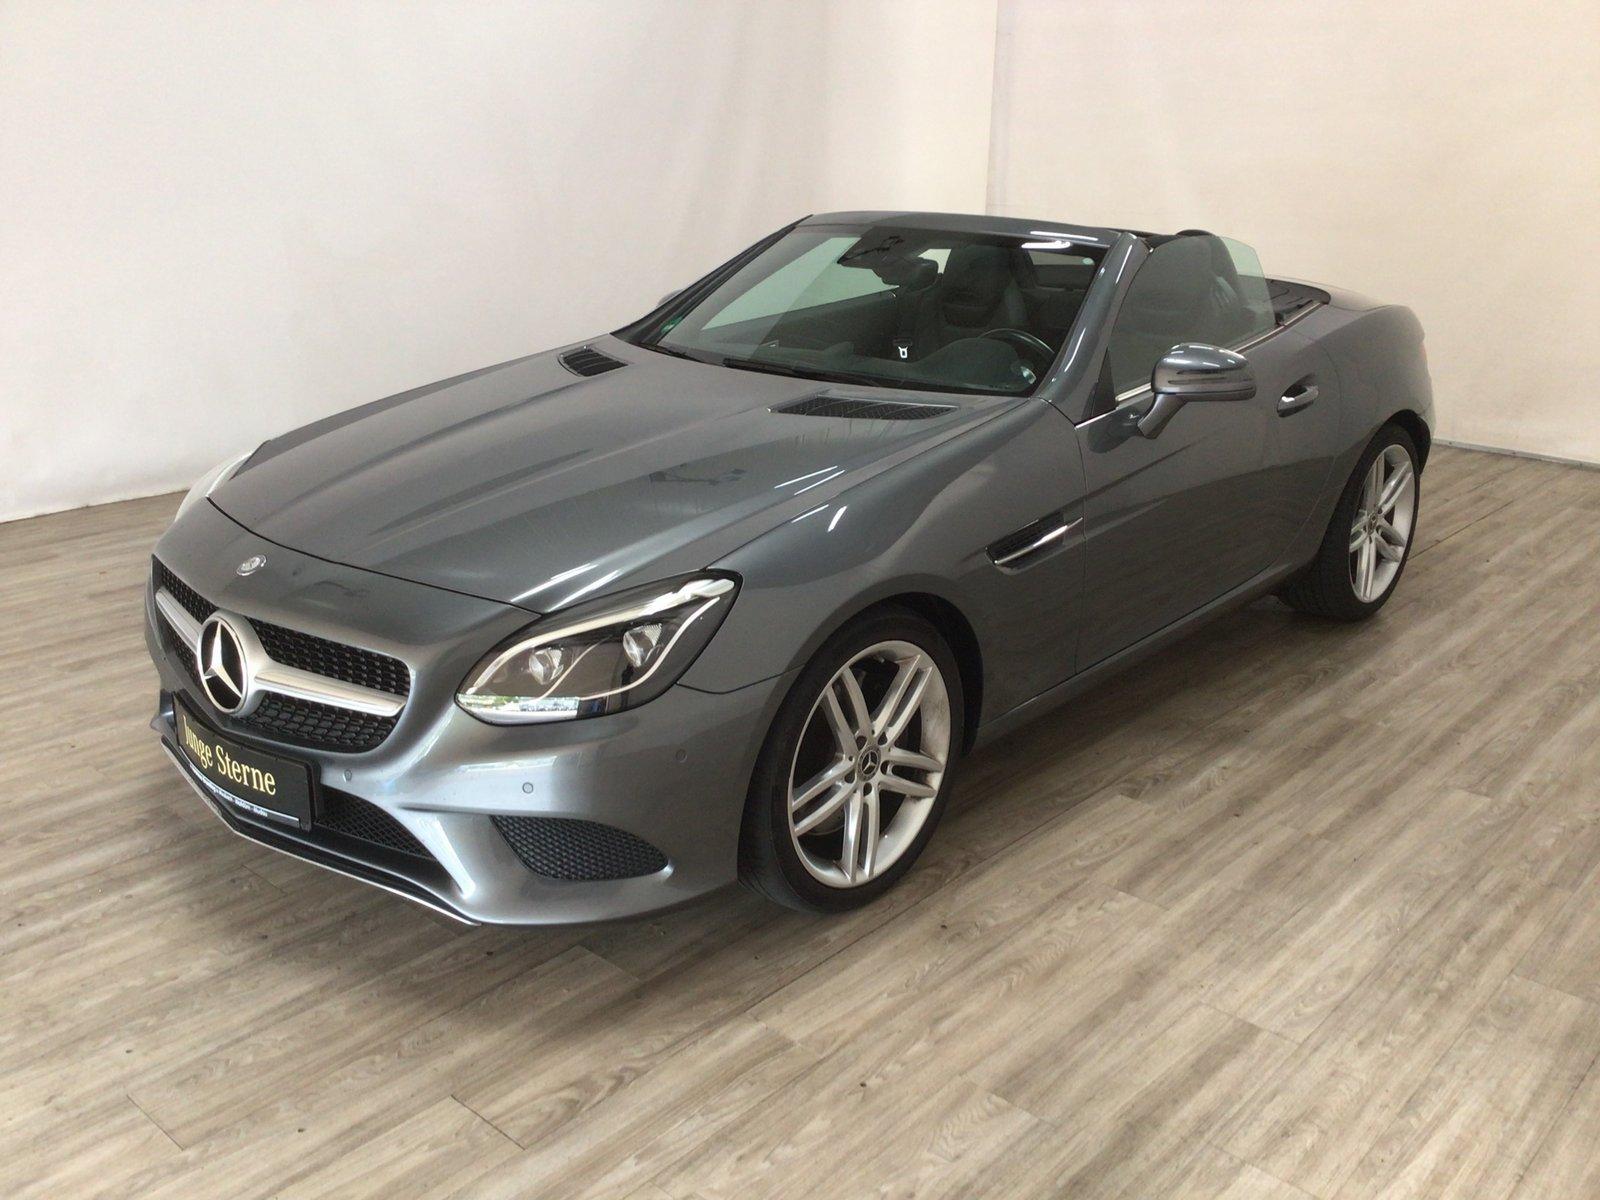 Mercedes-Benz SLC 200 Sport-Paket Navi*Kamera*ILS*THERMOTRONIC, Jahr 2017, Benzin